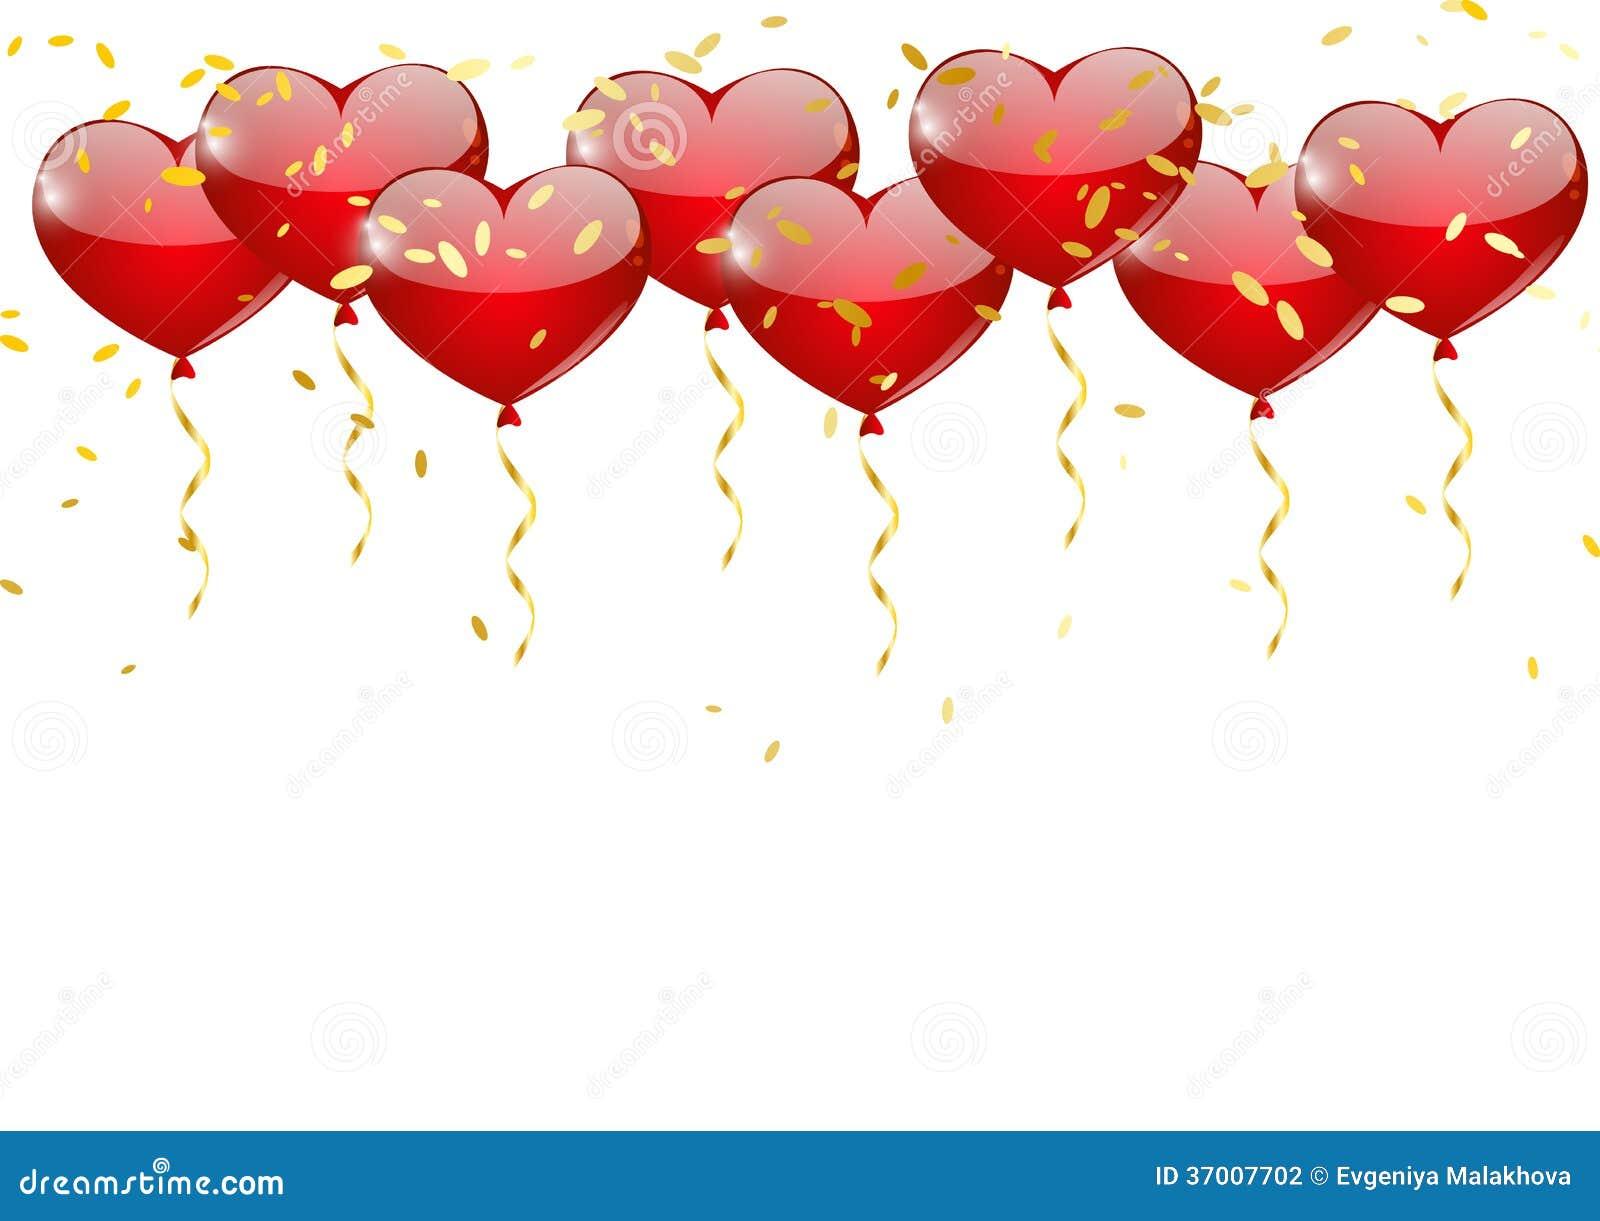 Heart balloons stock photography image 37007702 - How to make heart balloon ...